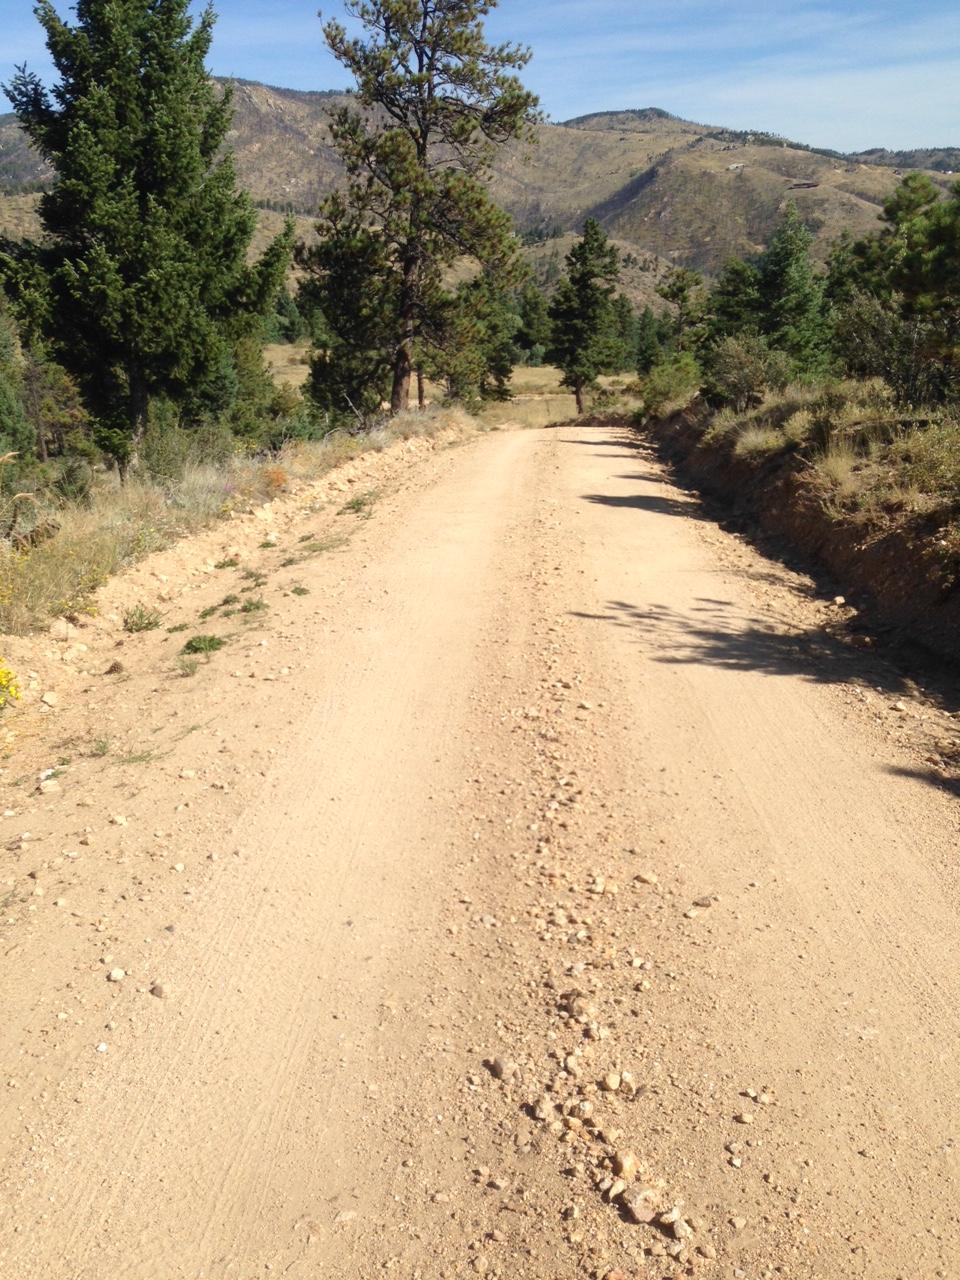 The road up Arkansas Mountain